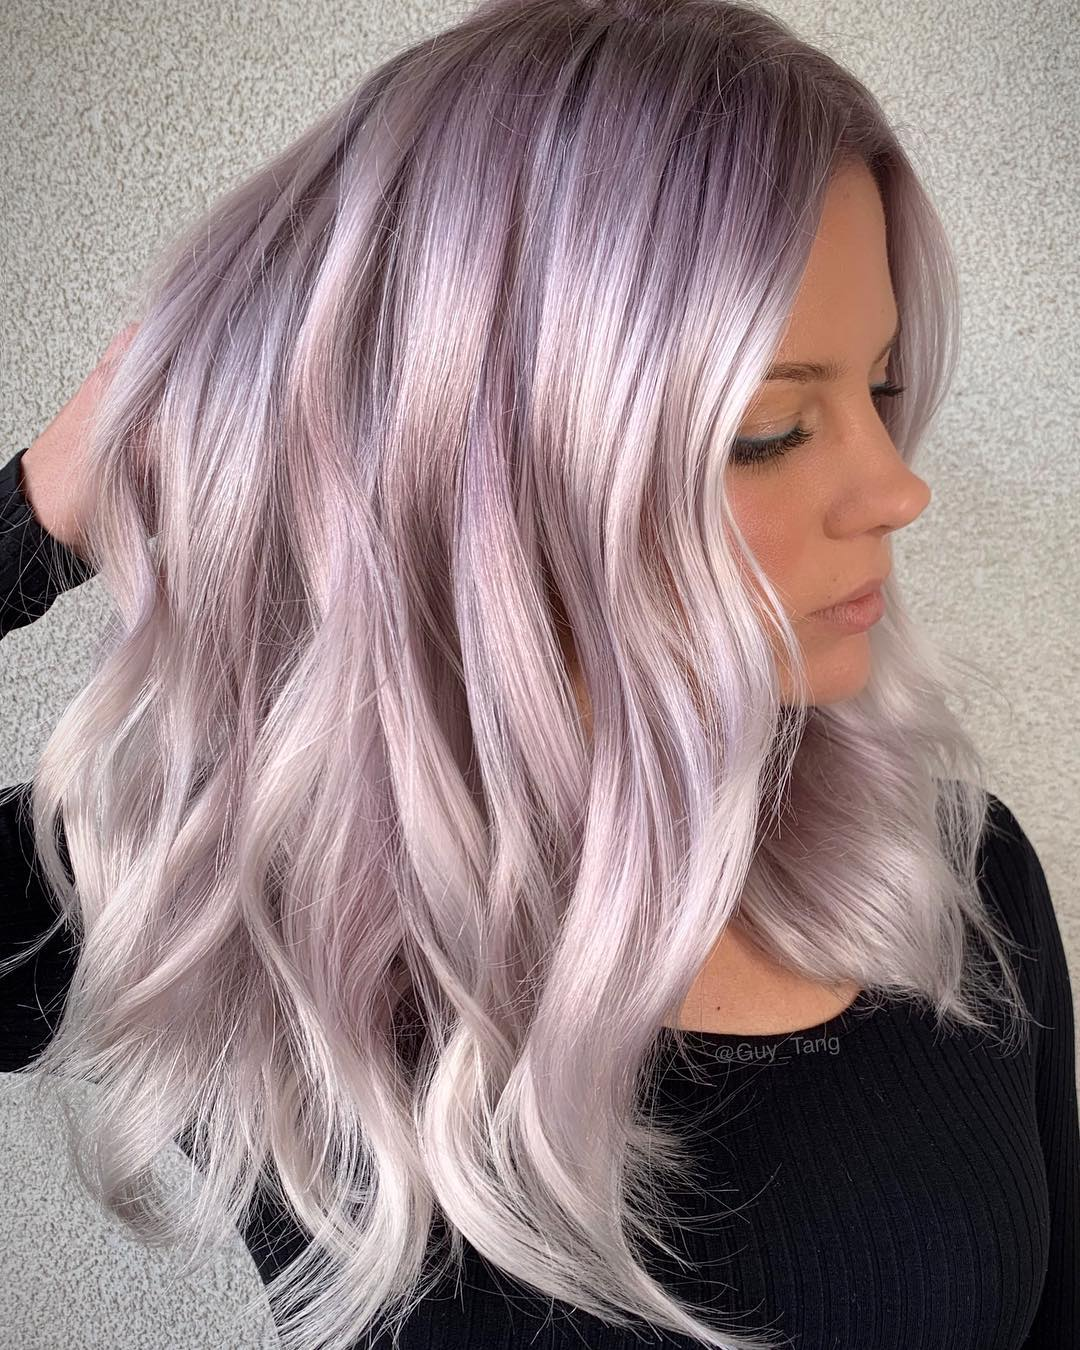 Цвет волос металлик фото 2